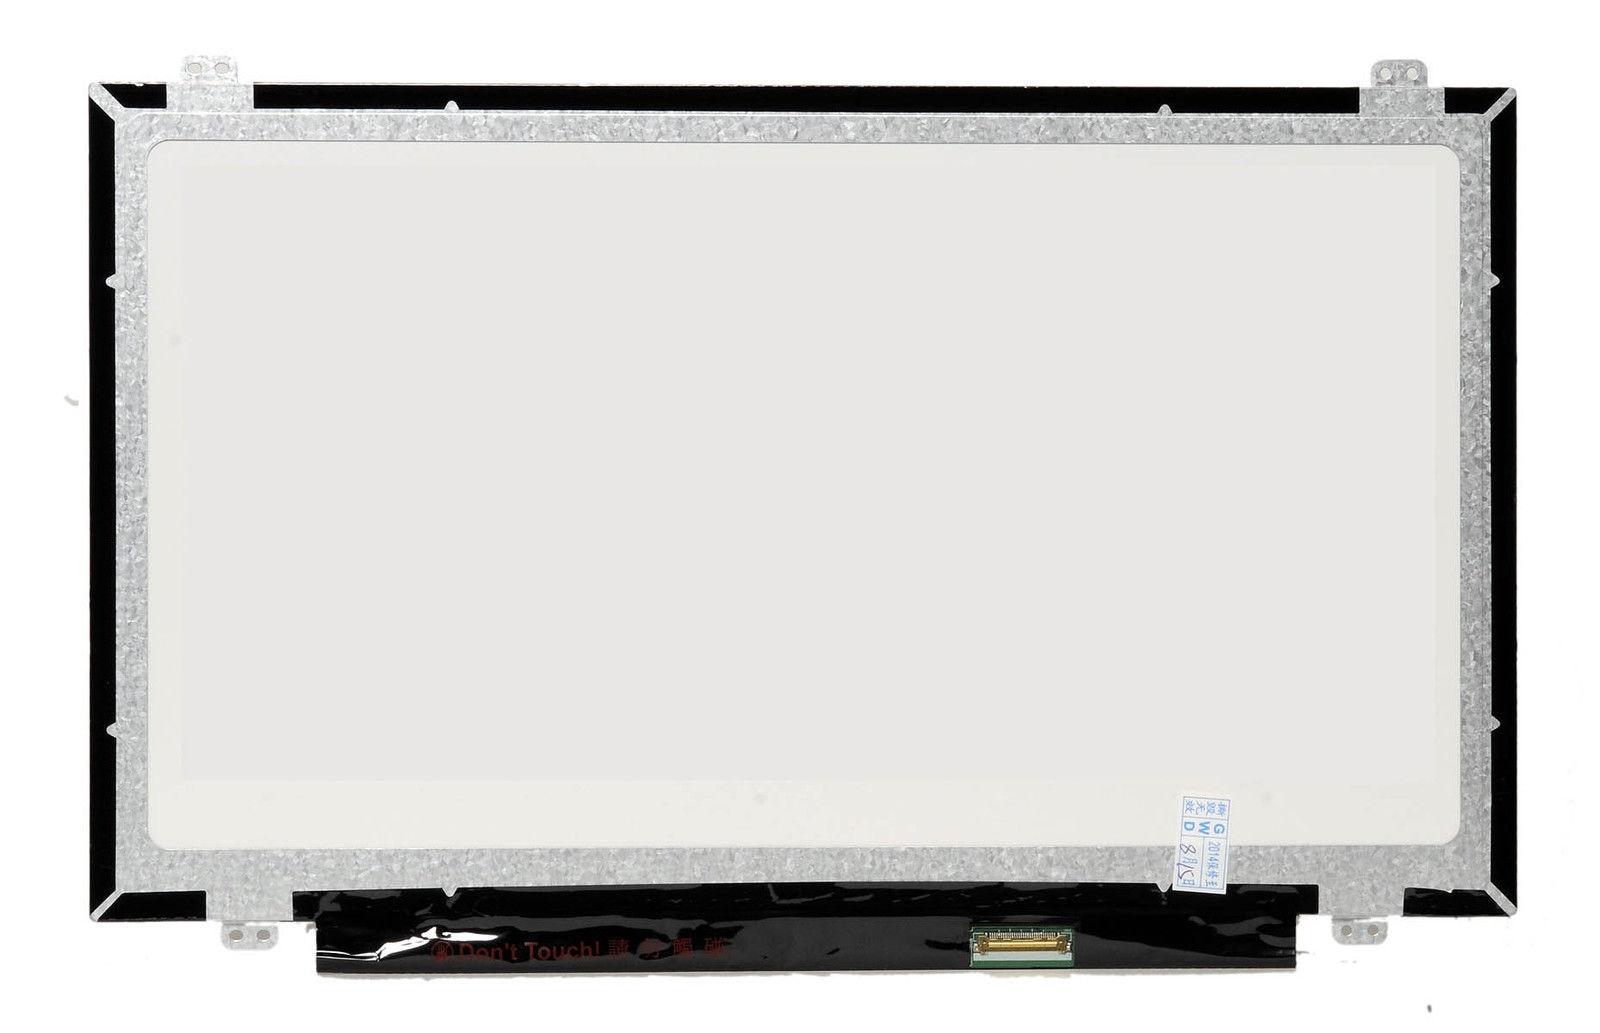 14.0 Slim Laptop LED LCD Screen HD WXGA 1366 x 768 Resolution for AUO Model: B140XTN02.0 & B140XTN02.3 brand new lp156wh3 tl s1 laptop slim led lcd screen lp156wh3 tls1 for fujitsu lifebook ah532 15 6 wxga hd